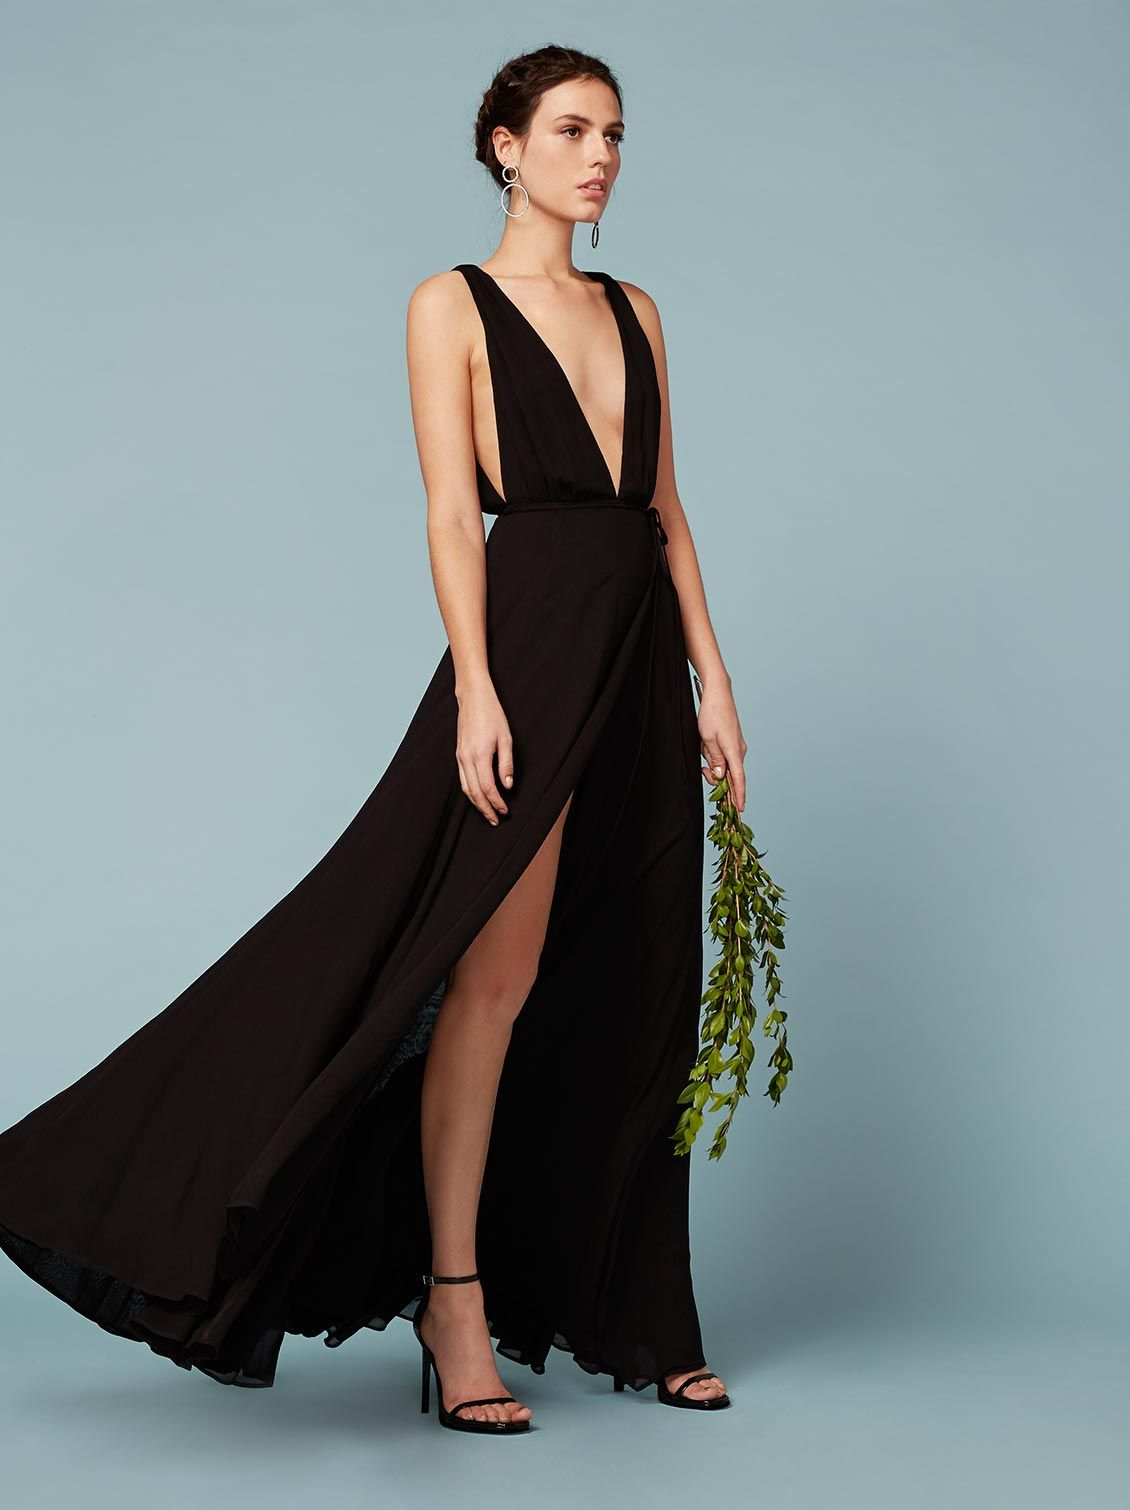 Winslow Dress | Sophia dress, Reformation and Wrap dresses